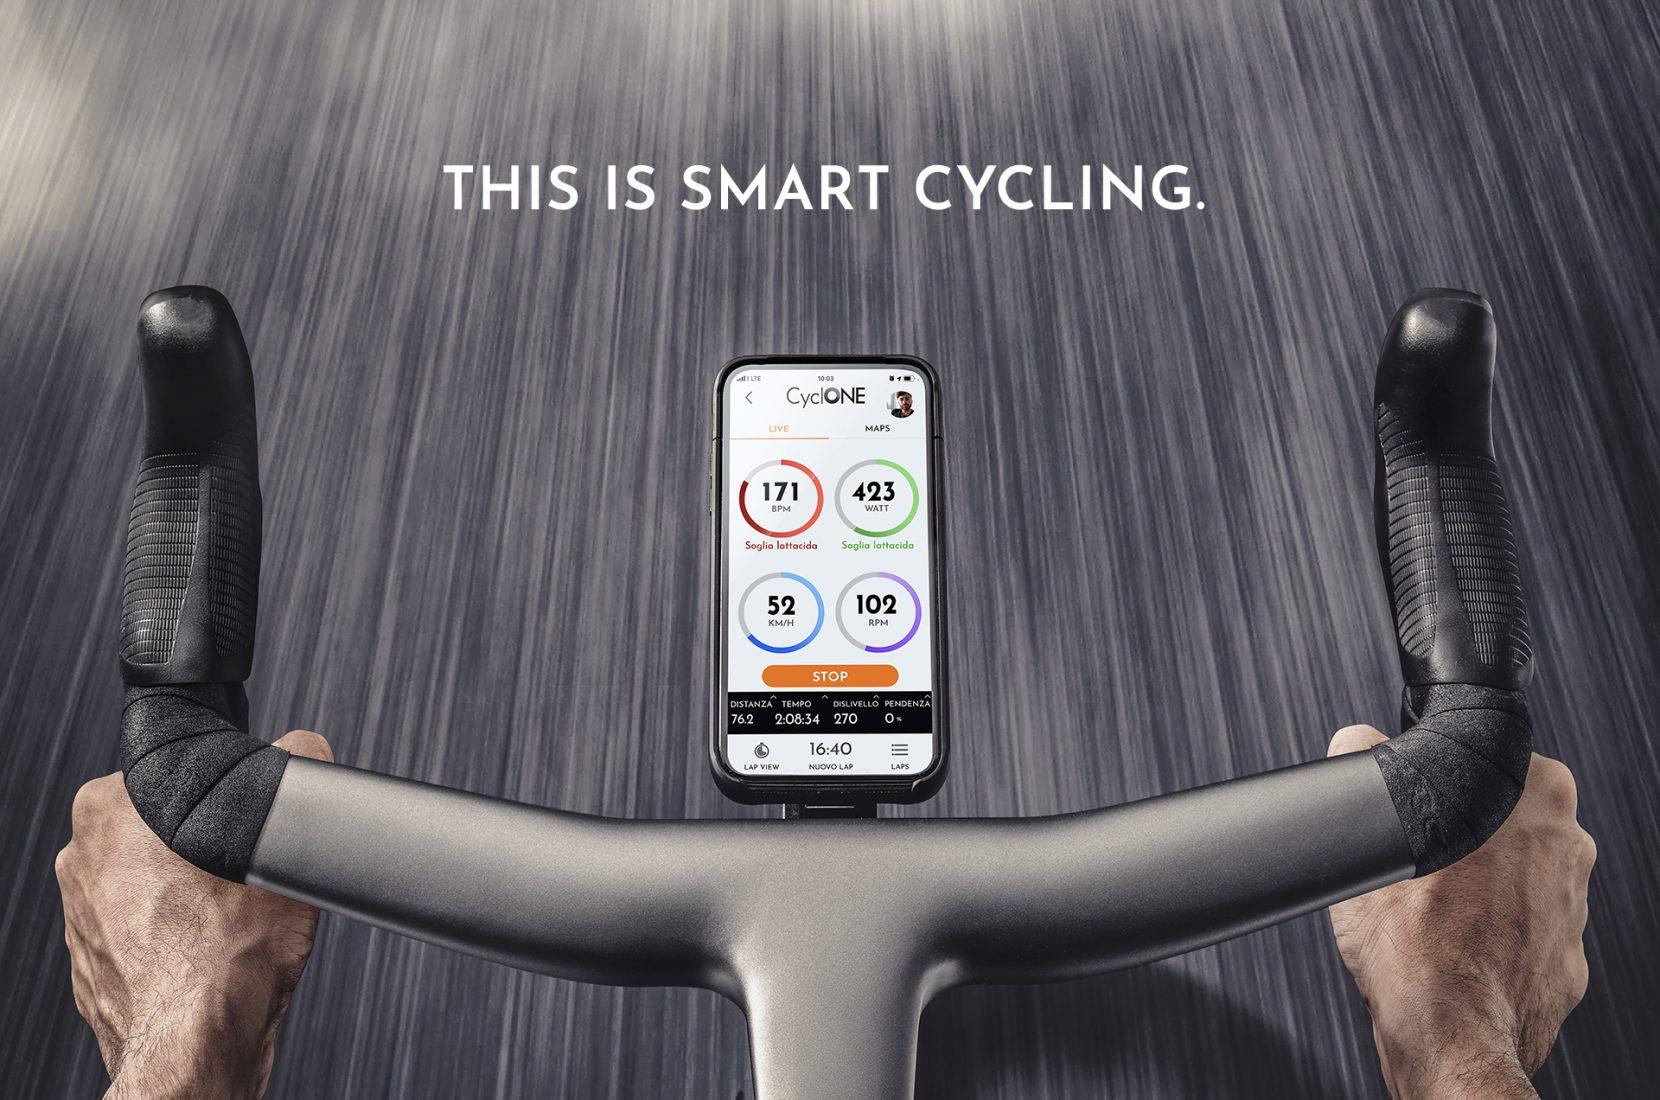 Cyclone: Smart Cycling